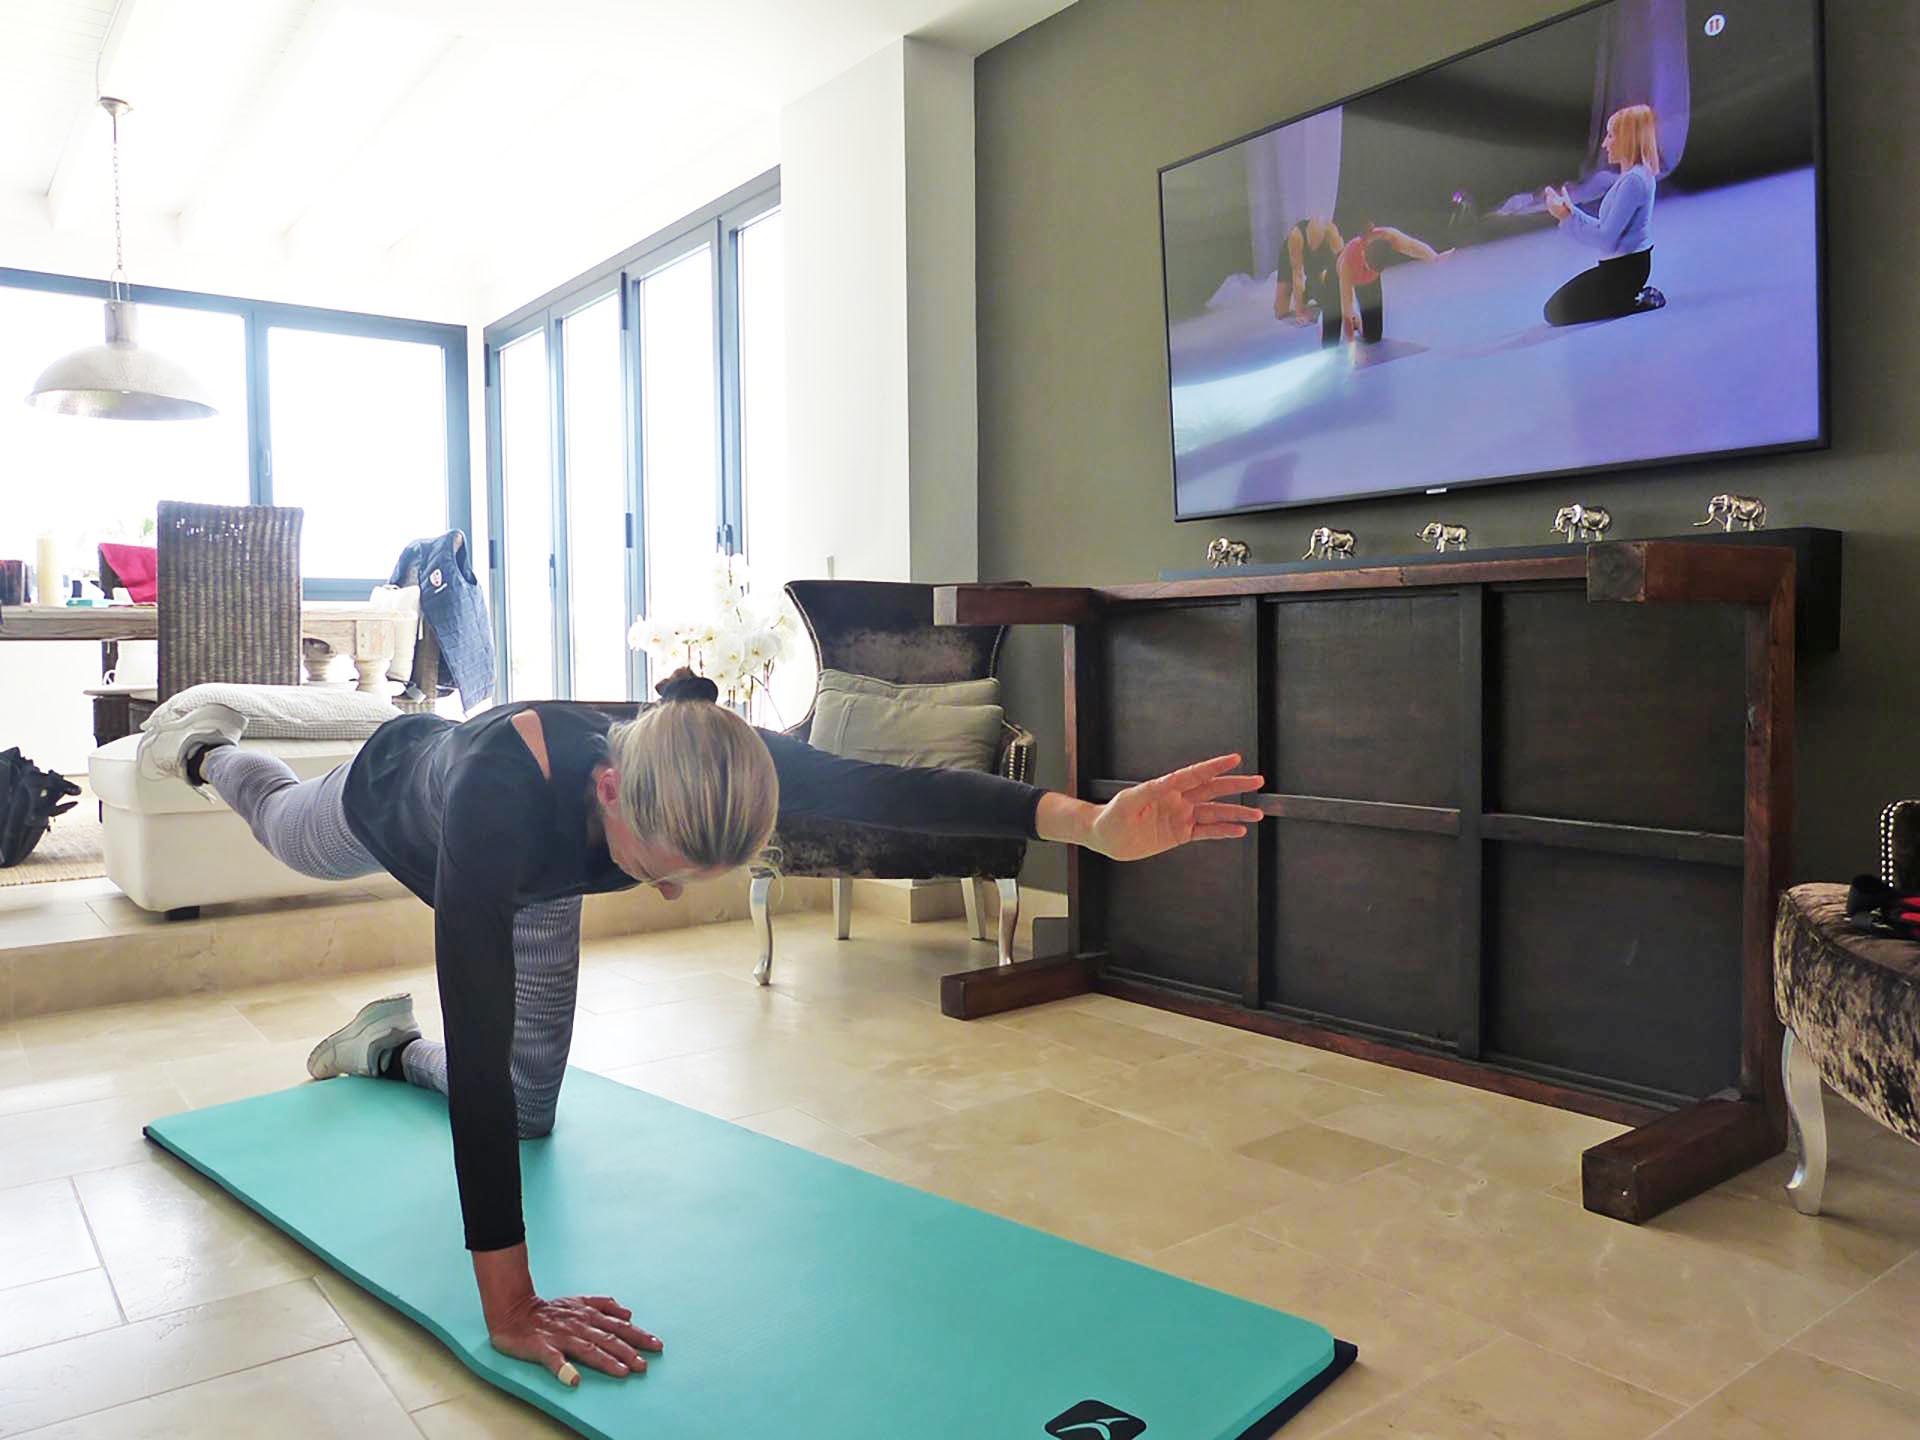 keeping-fit-at-home-quarantine-covid19-sotogrande-2020-3